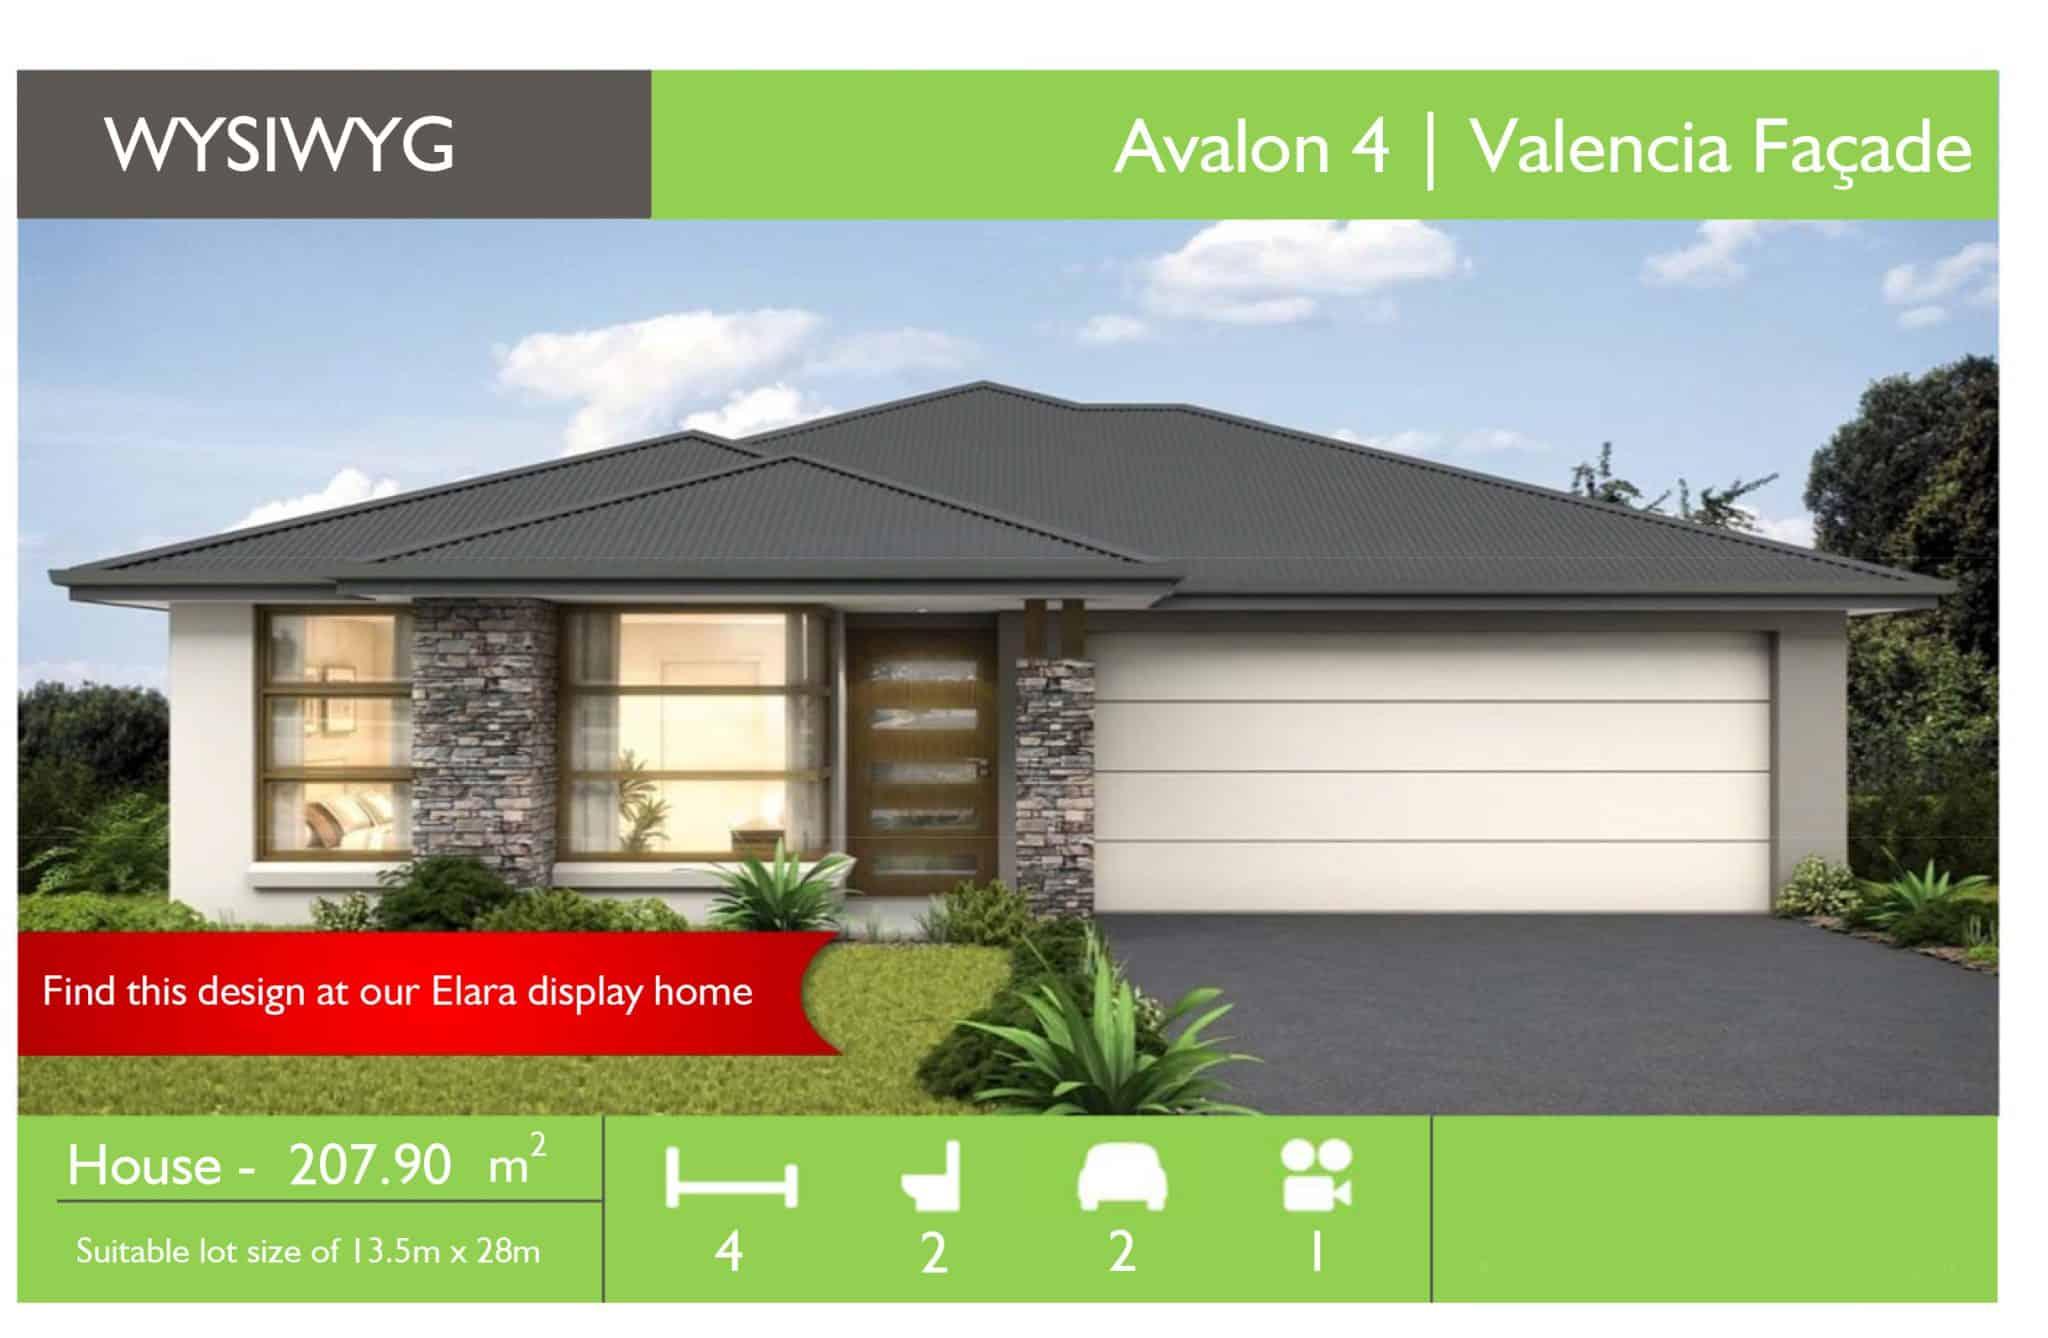 WYSIWYG Elara - Avalon 4 Valencia - Sydney Quick Qoute.xlsm